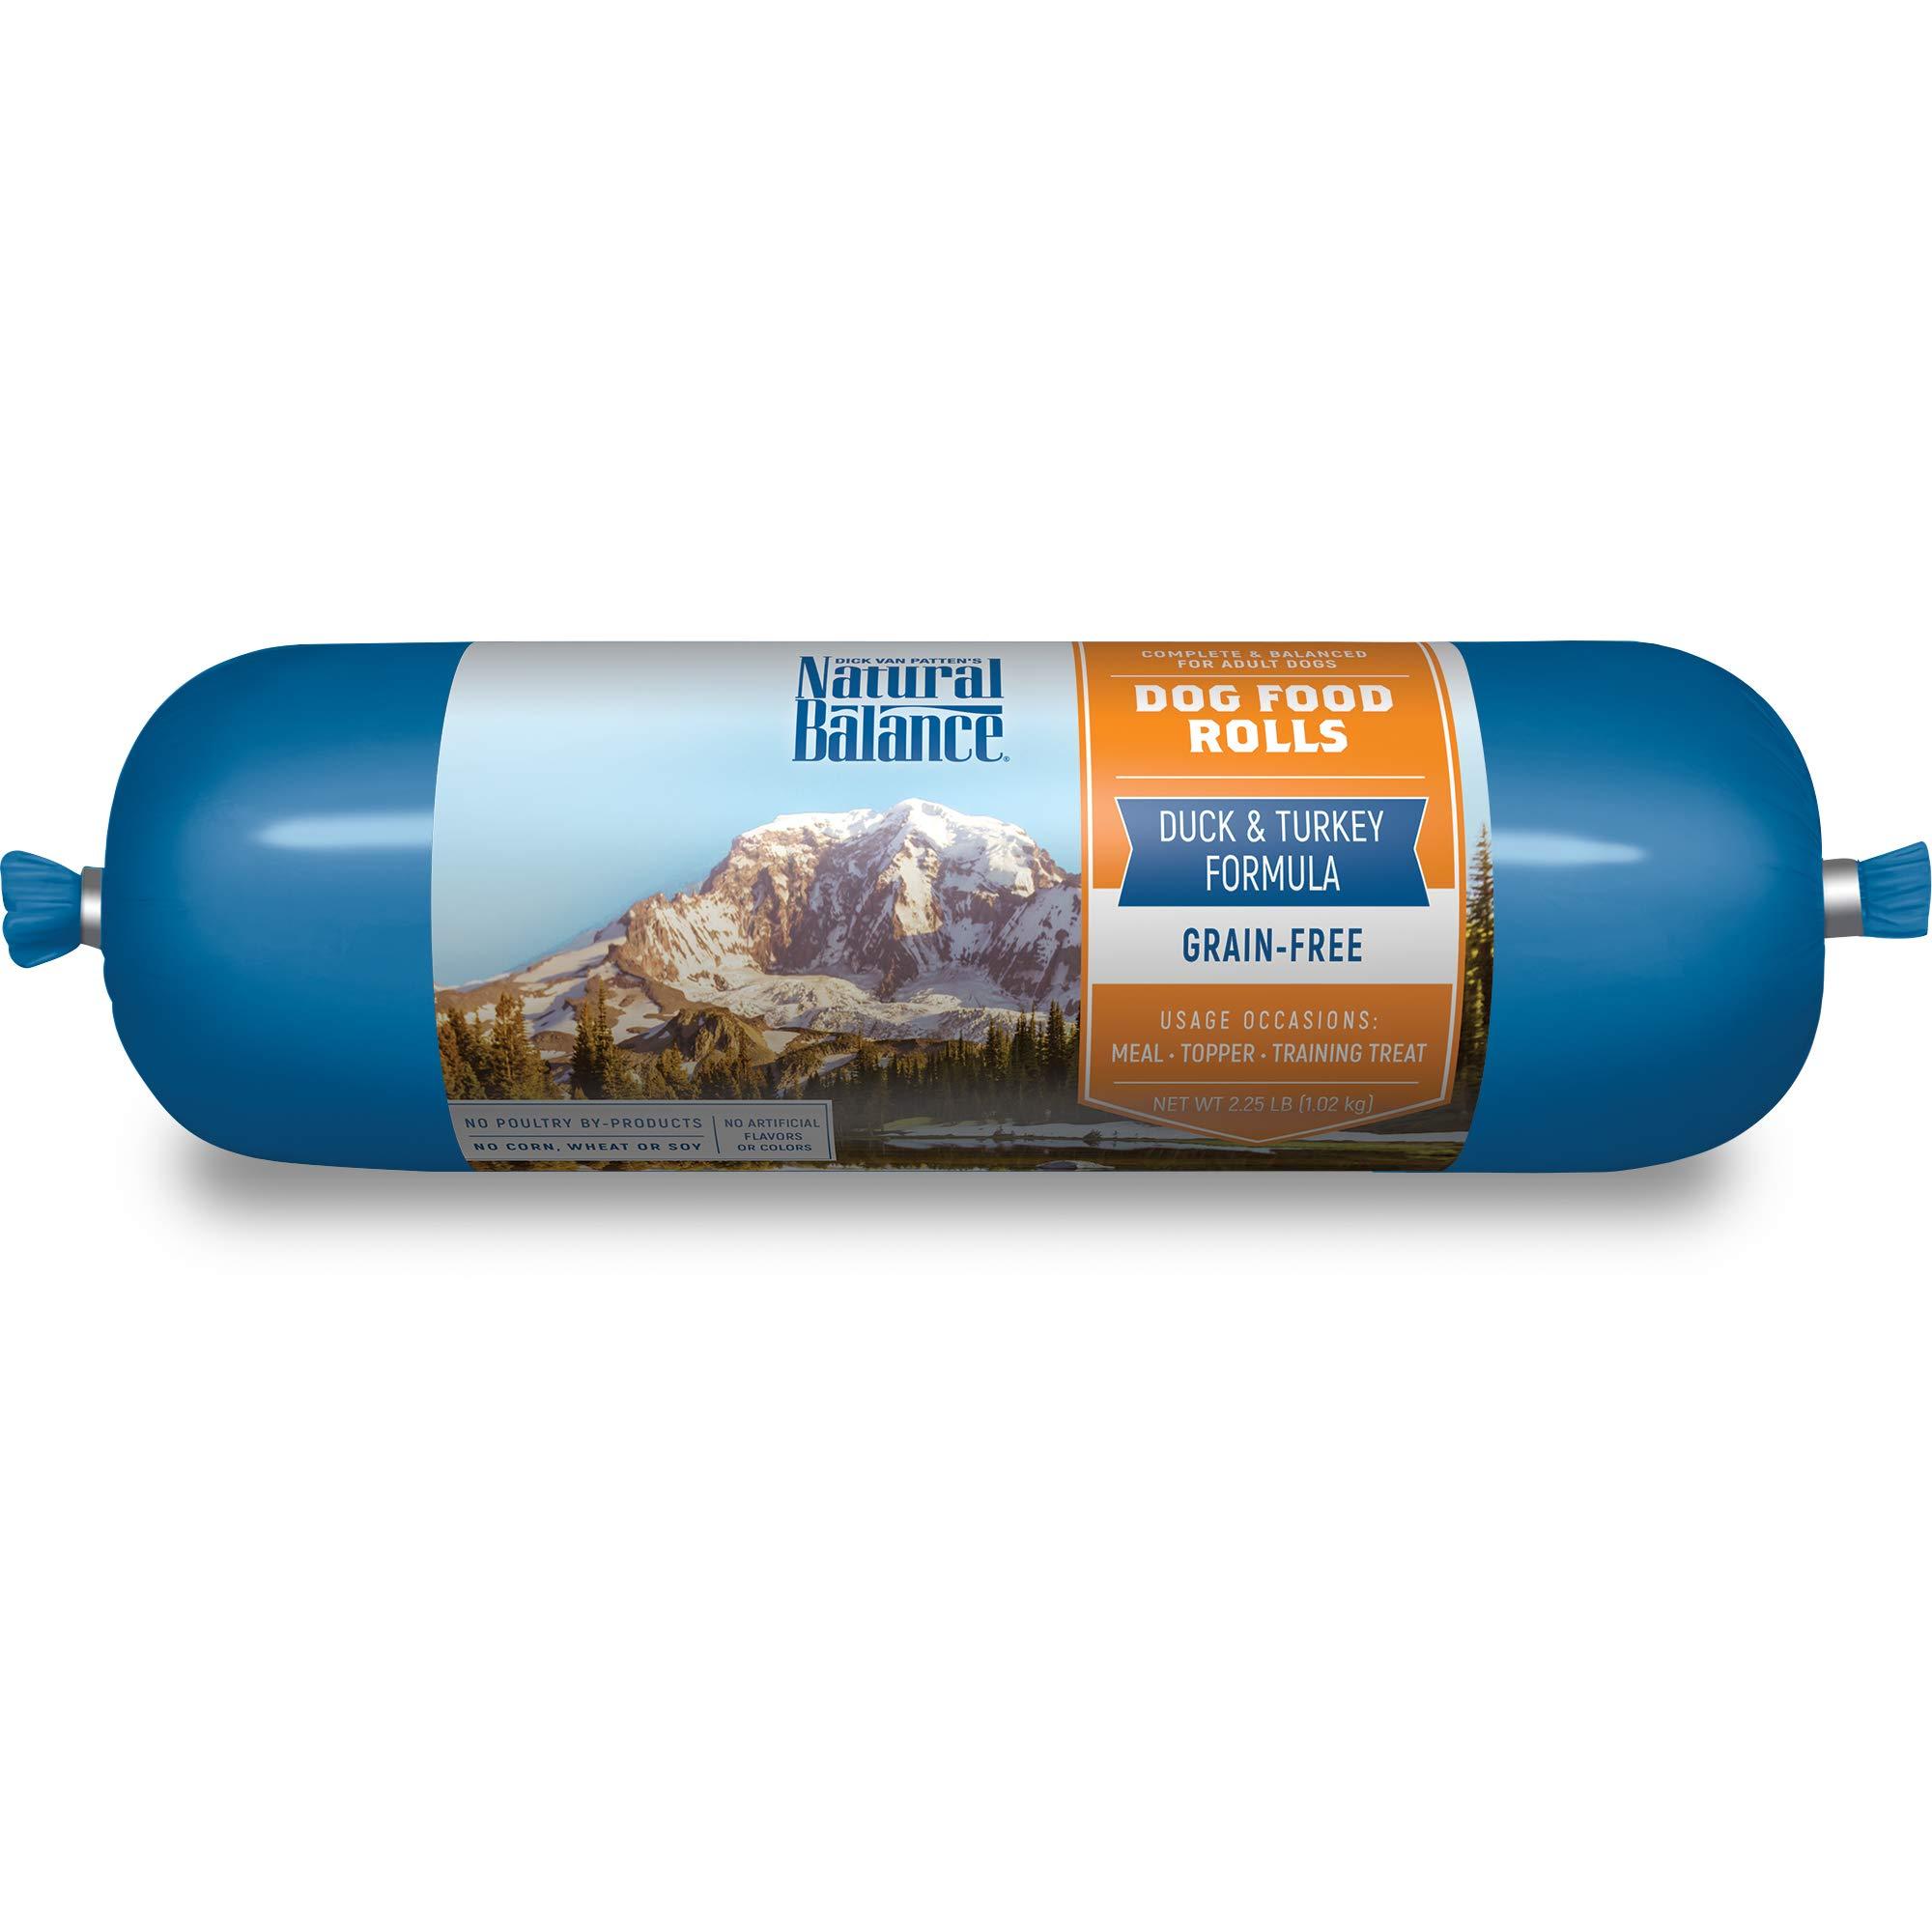 Natural Balance Dog Food Roll, Duck & Turkey Formula, 2.25-Pound by Natural Balance